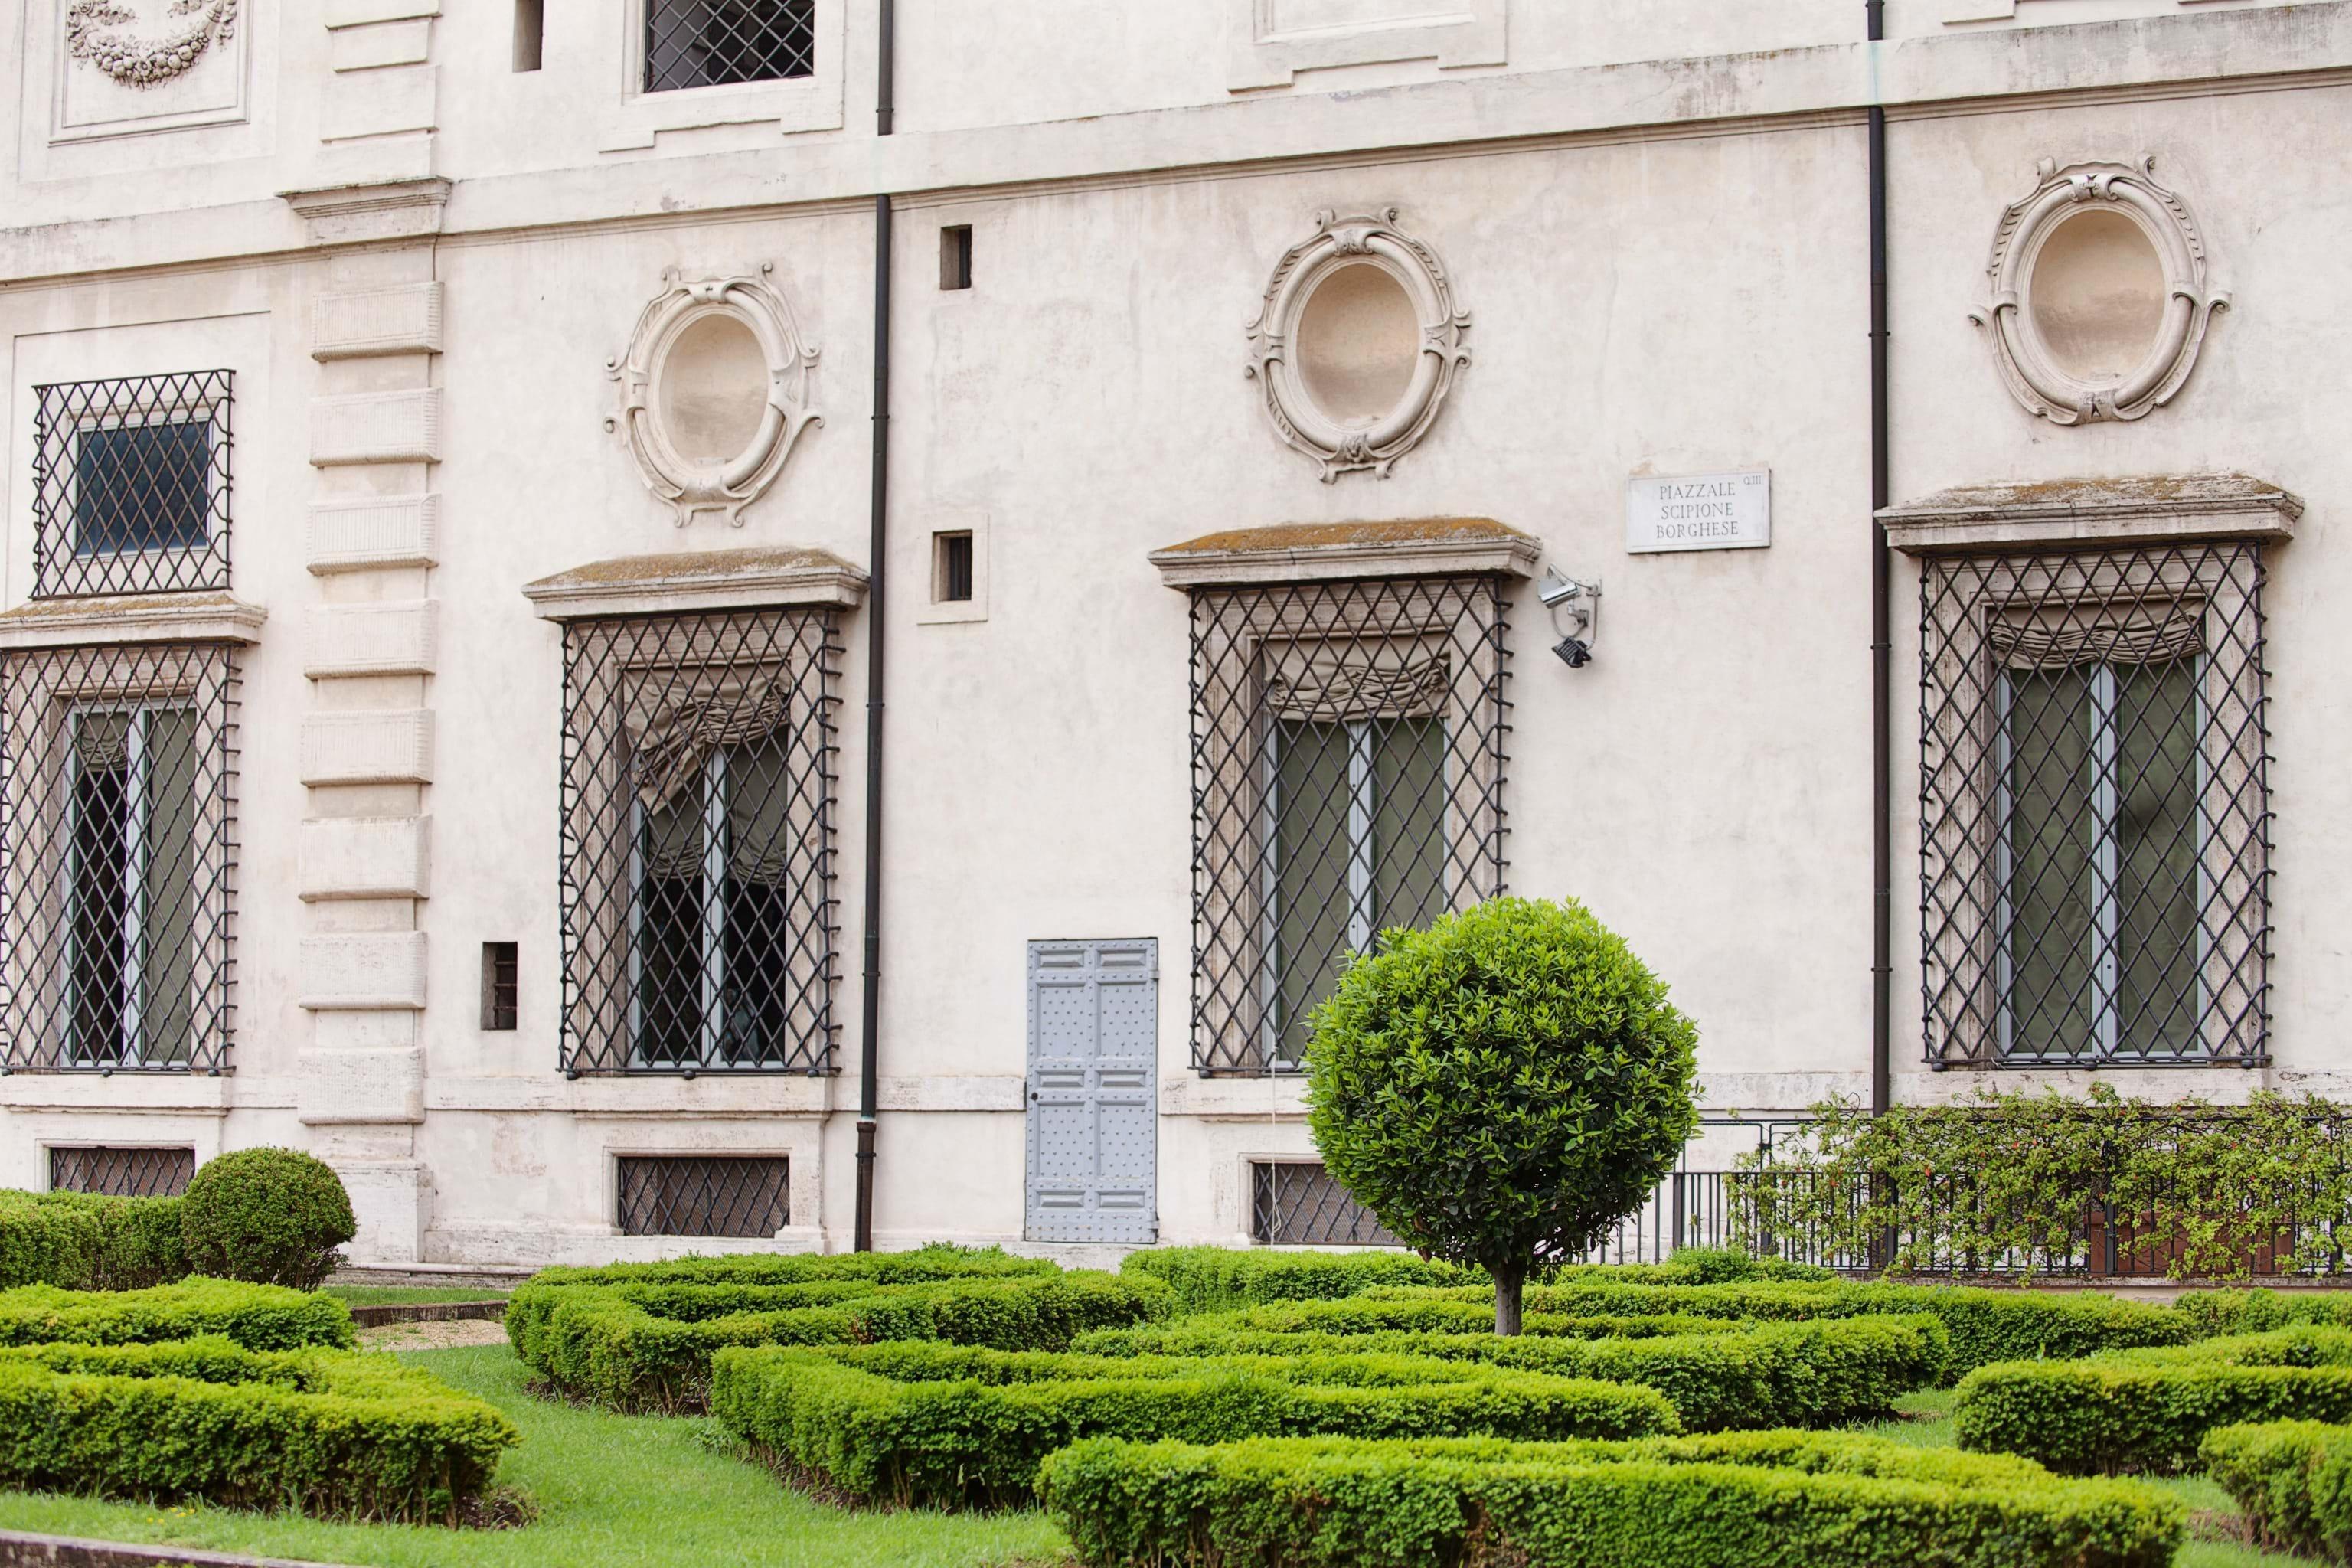 Villa Borghese Gallery Gardens Tour City Wonders